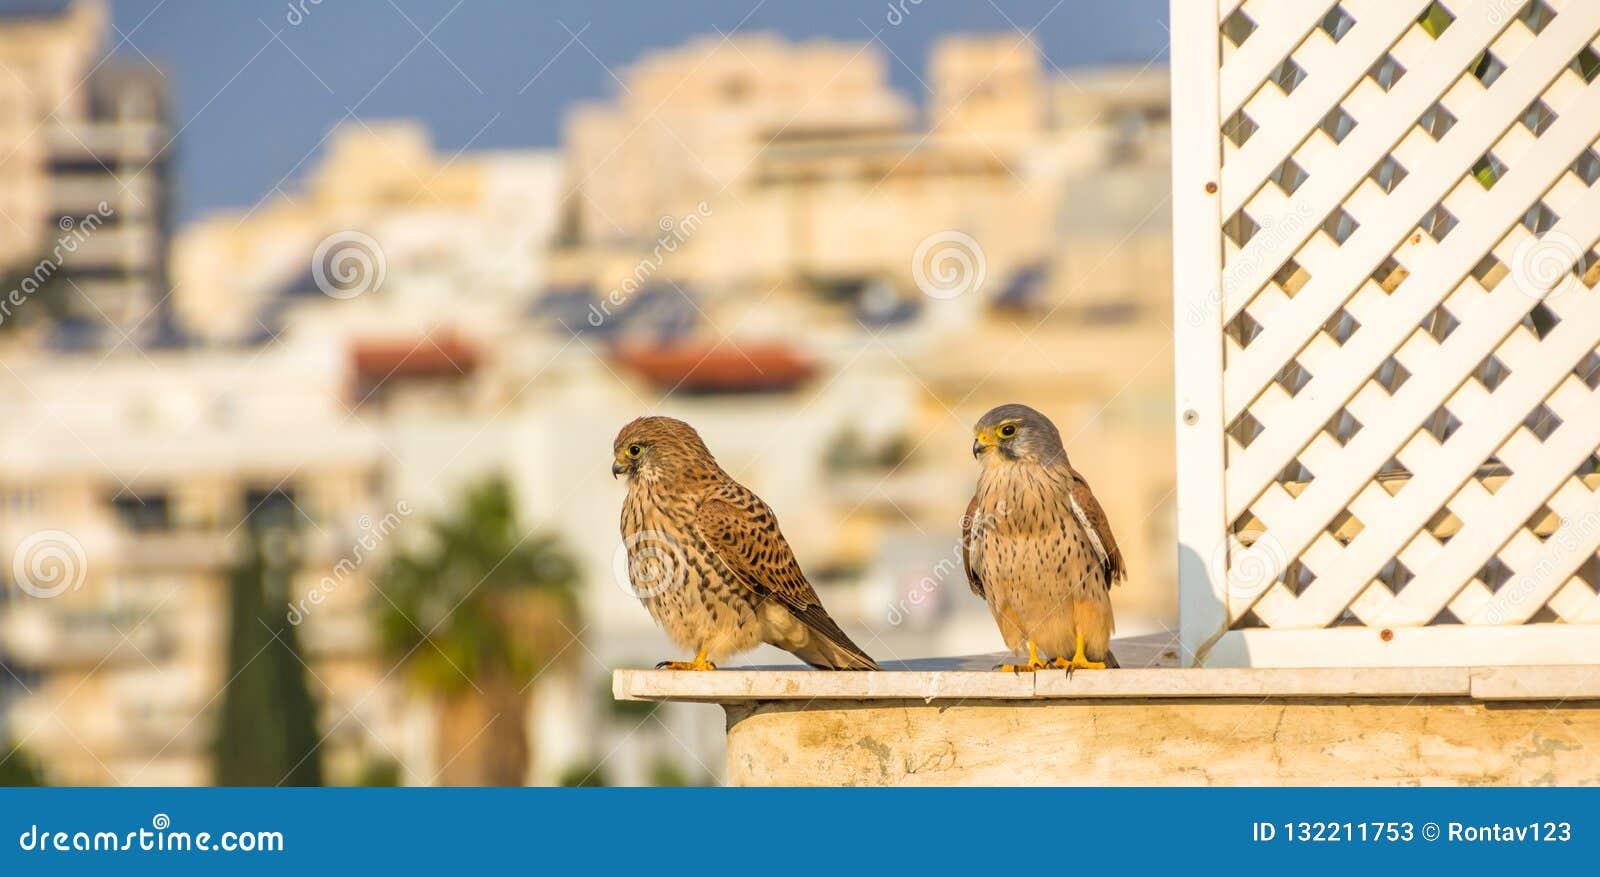 Female and male common kestrel Falco tinnunculus